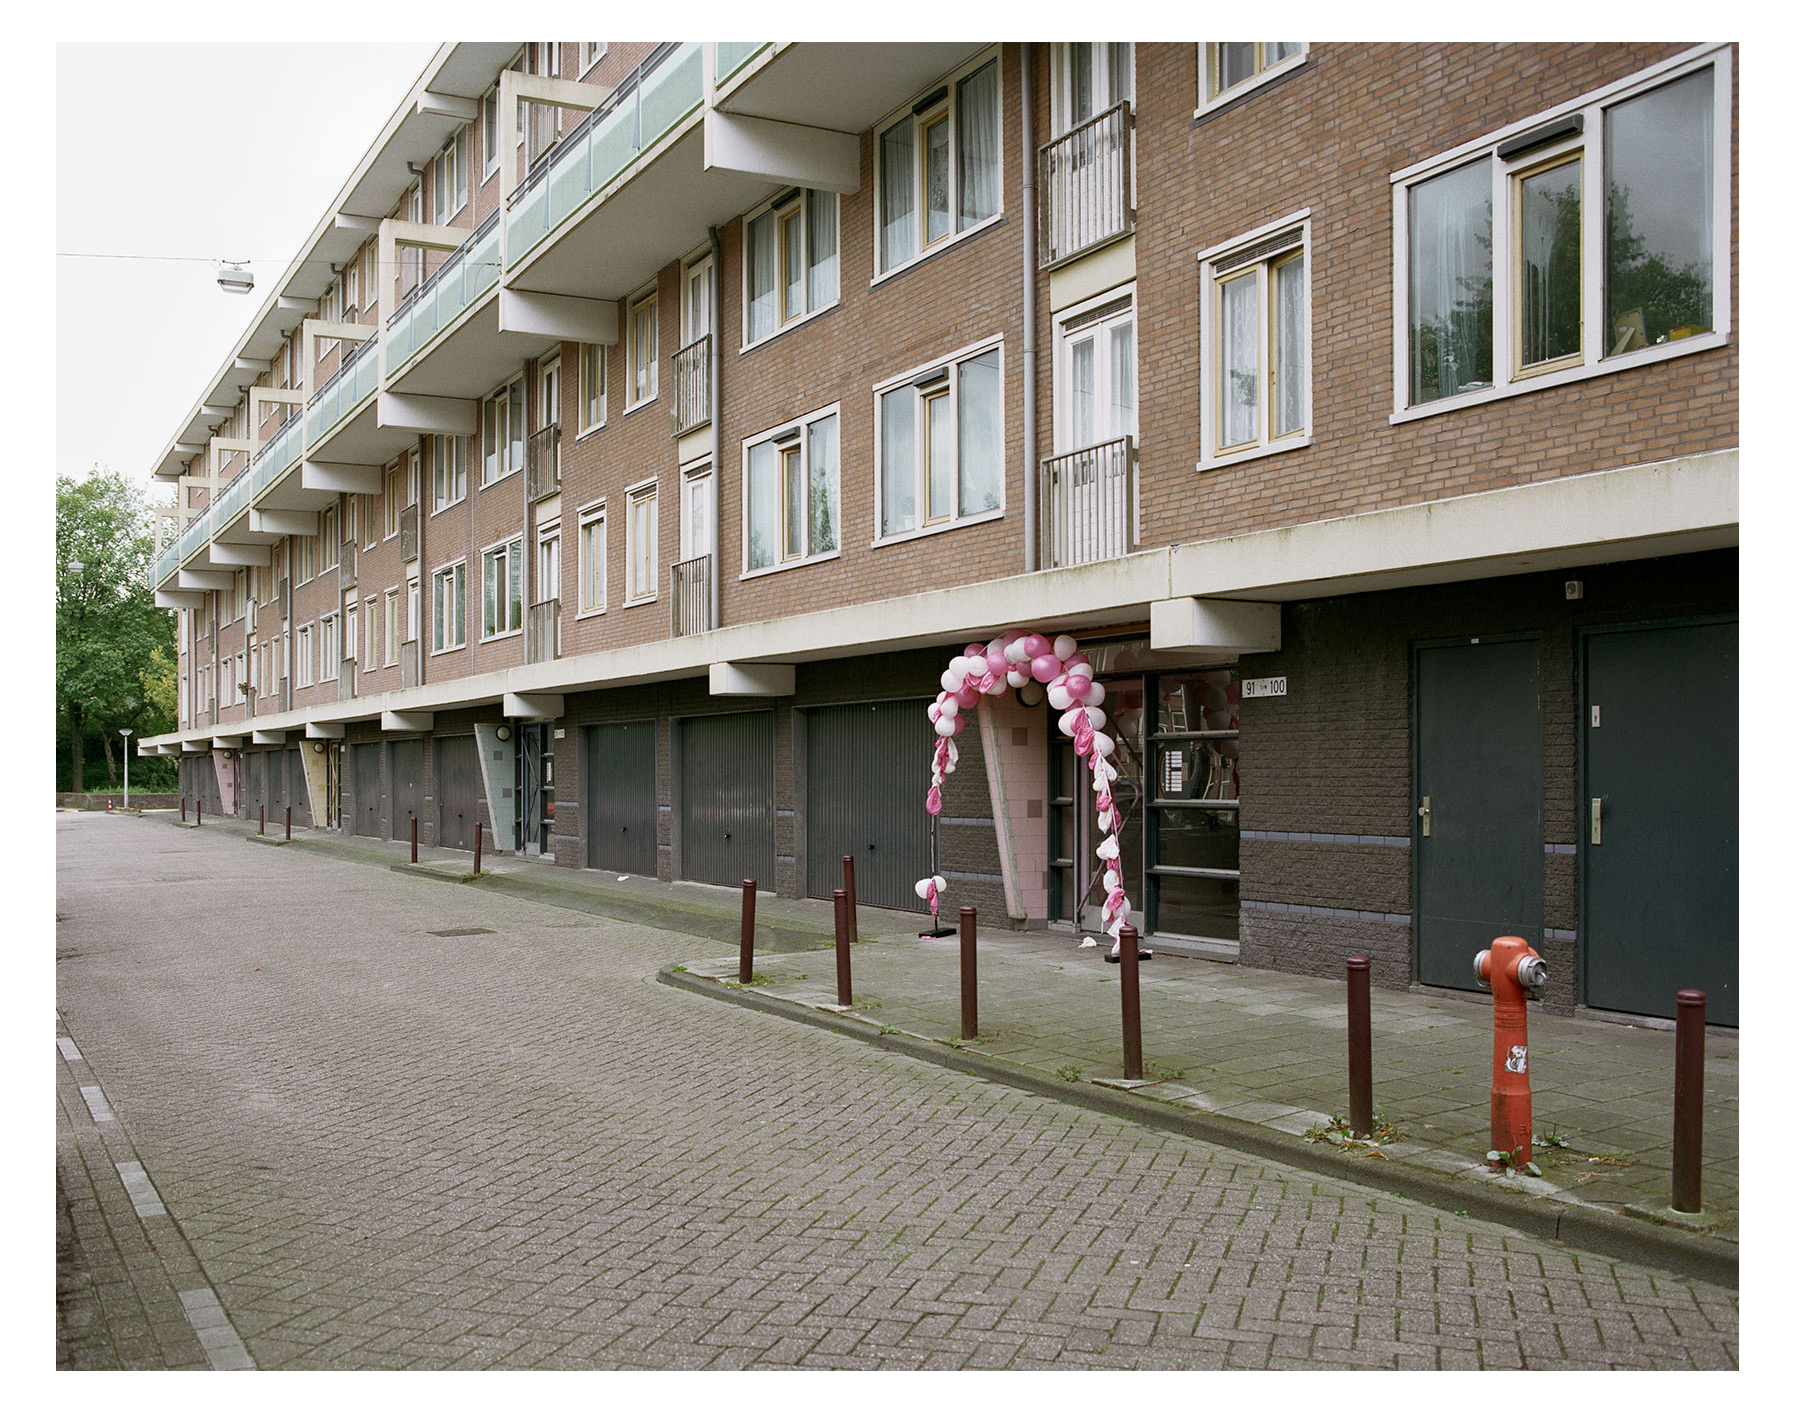 Birthdayparty_Amsterdam_Netherlands.jpg